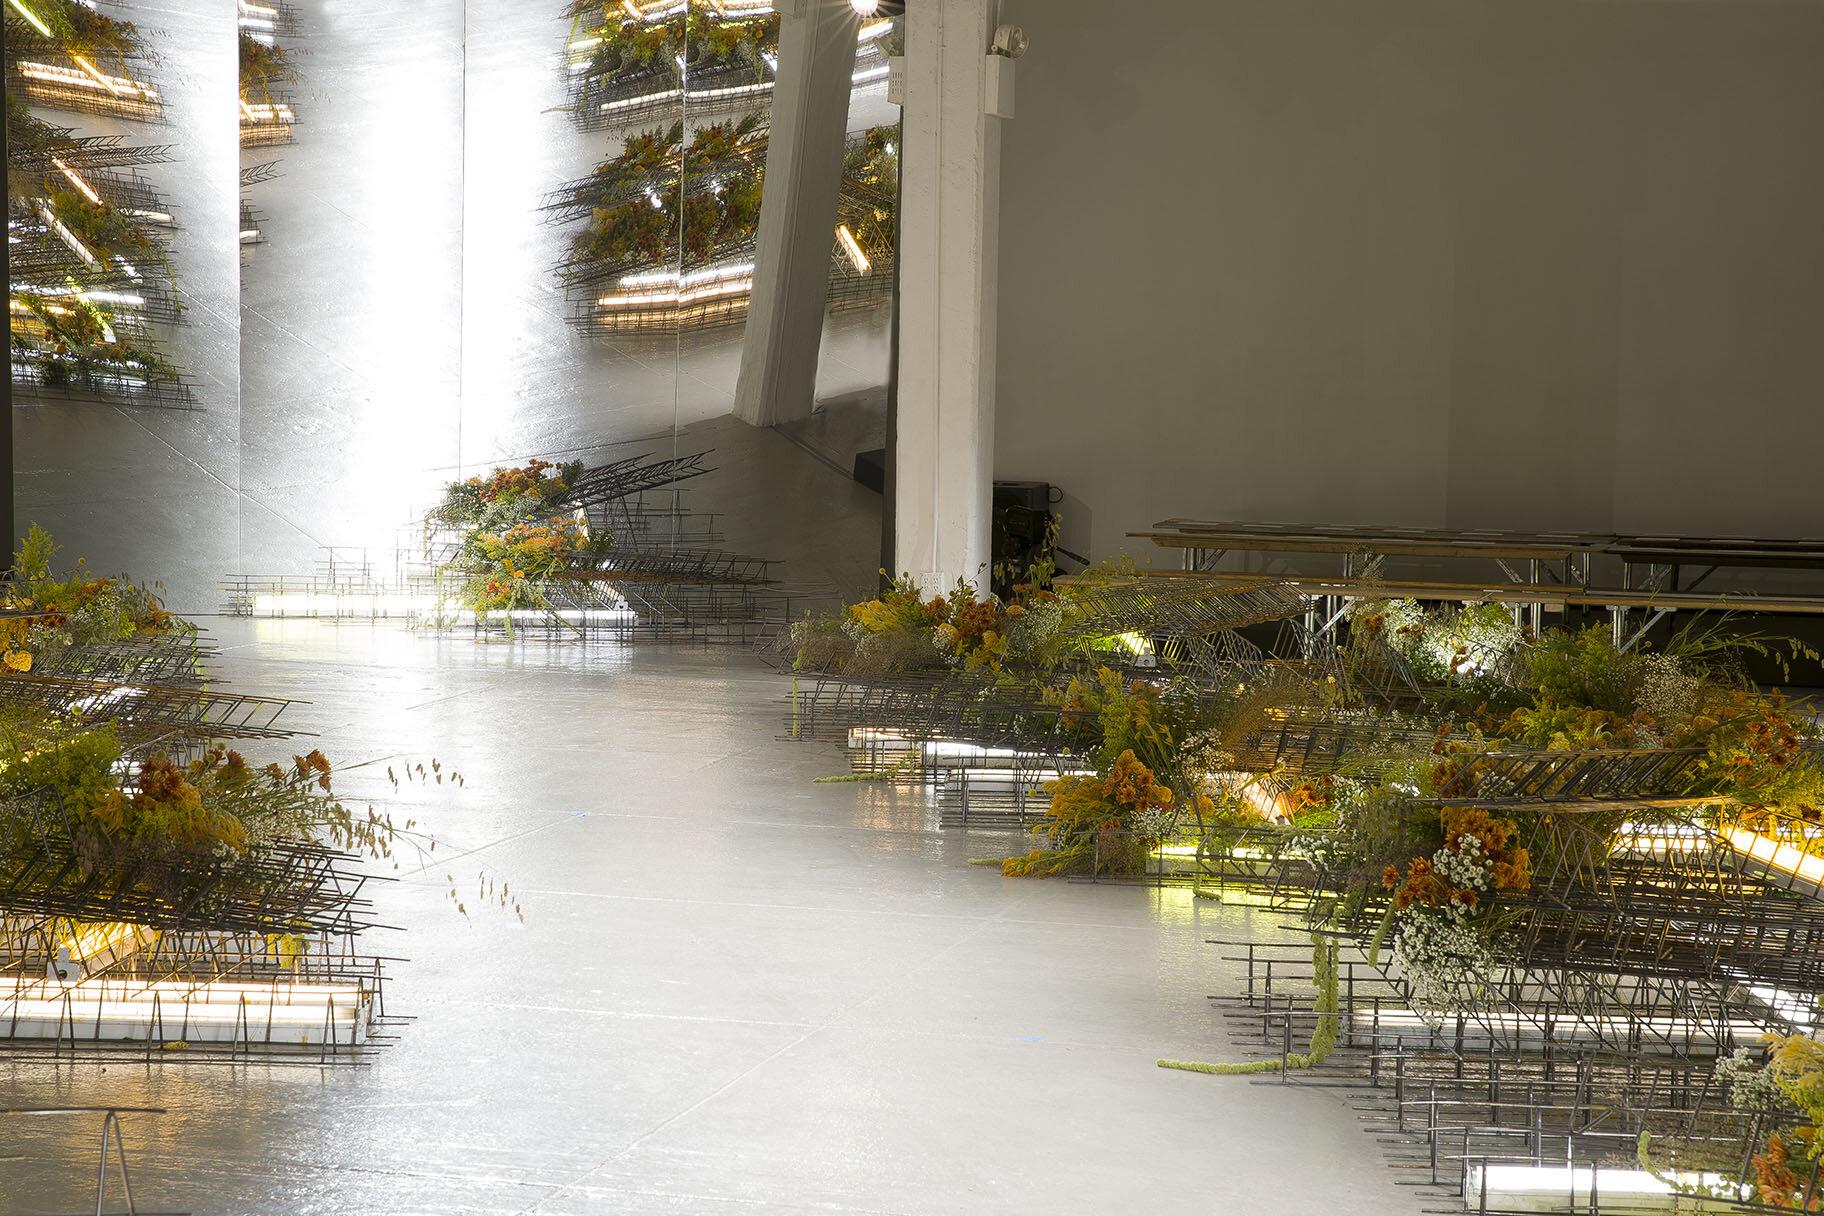 RODARTE-bureau-betak-new-york-gallery-guillaume-ziccarelli-03.jpg